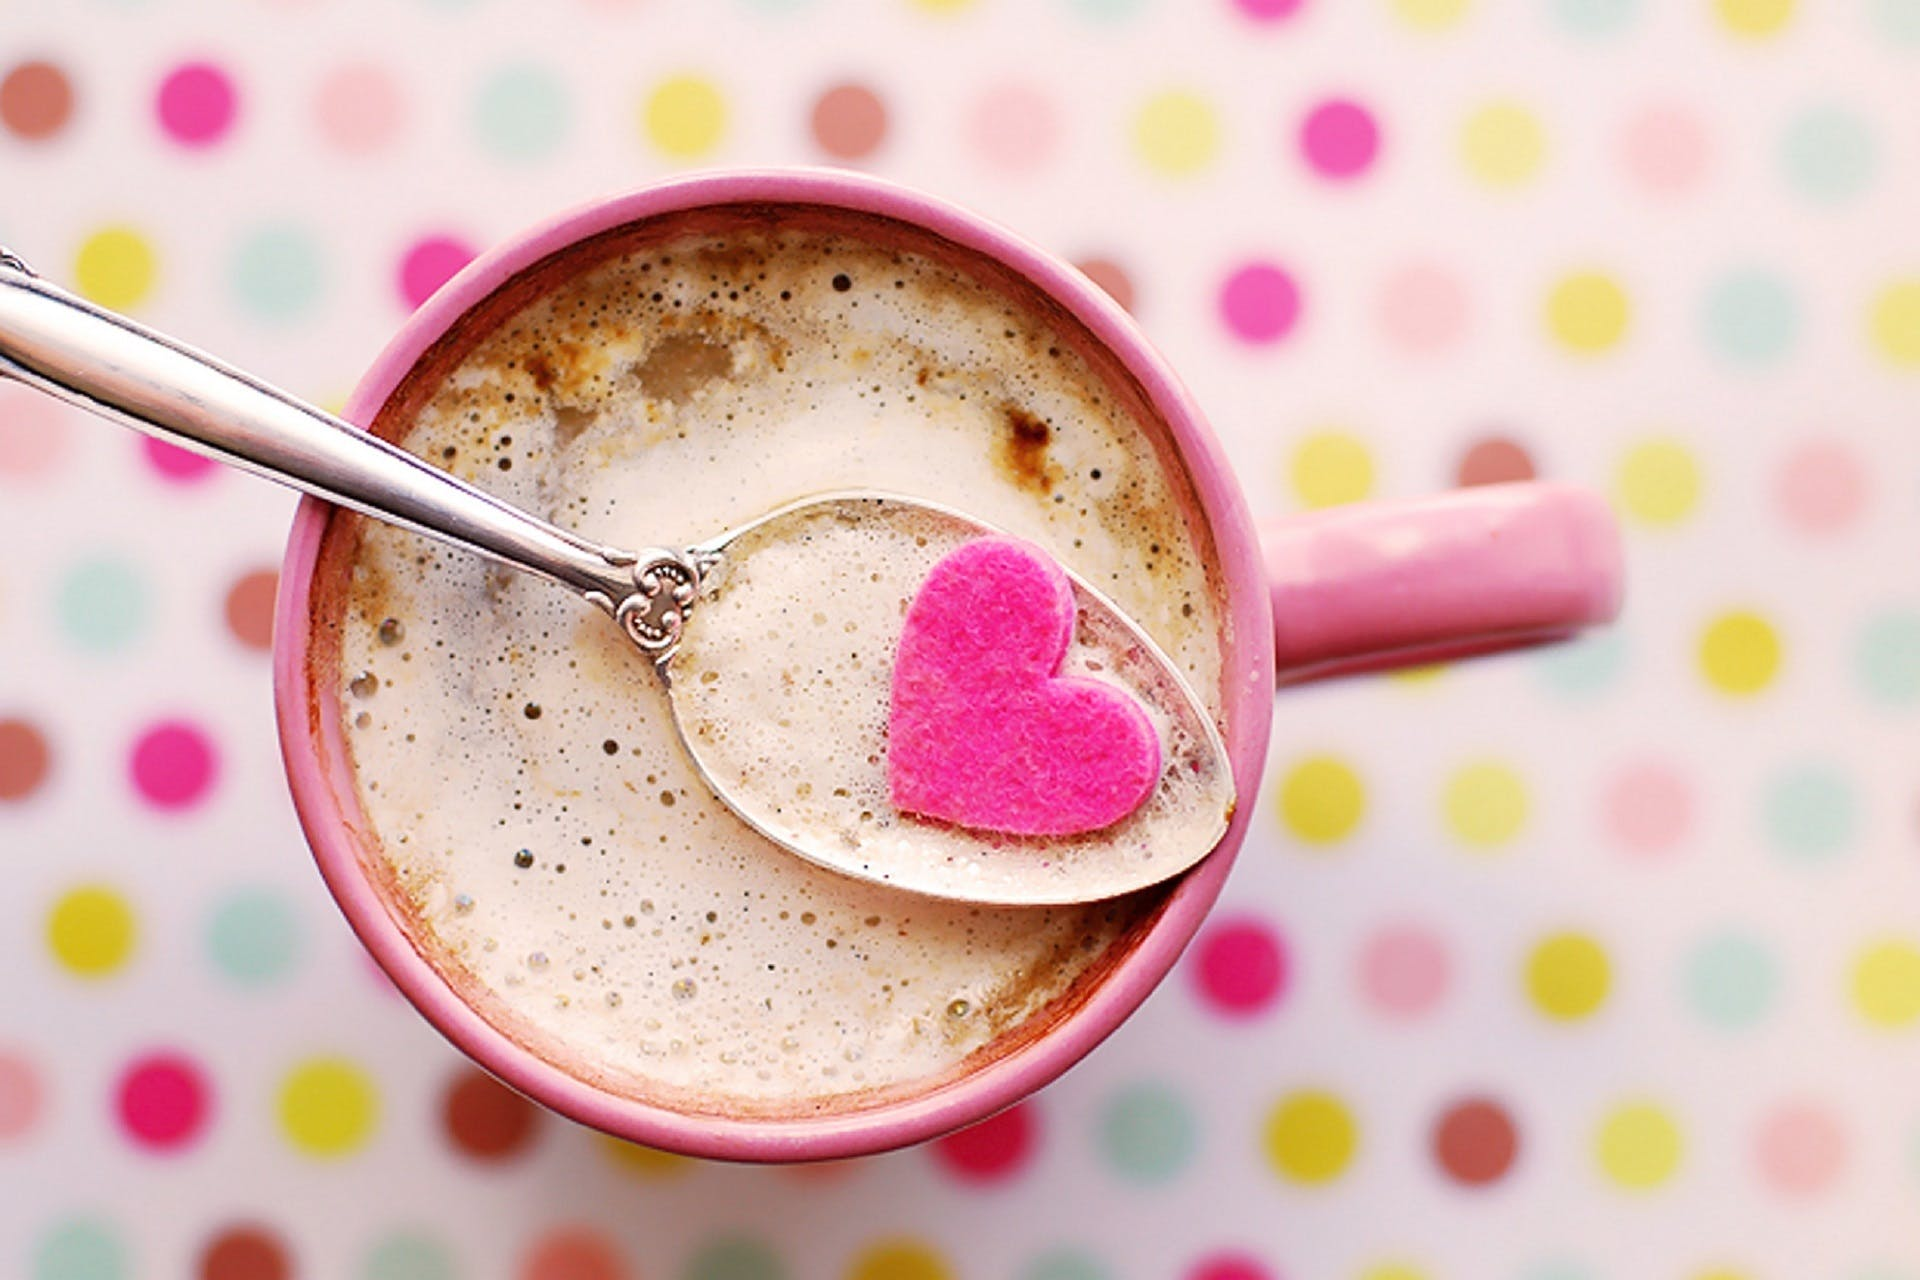 beverage, breakfast, close-up